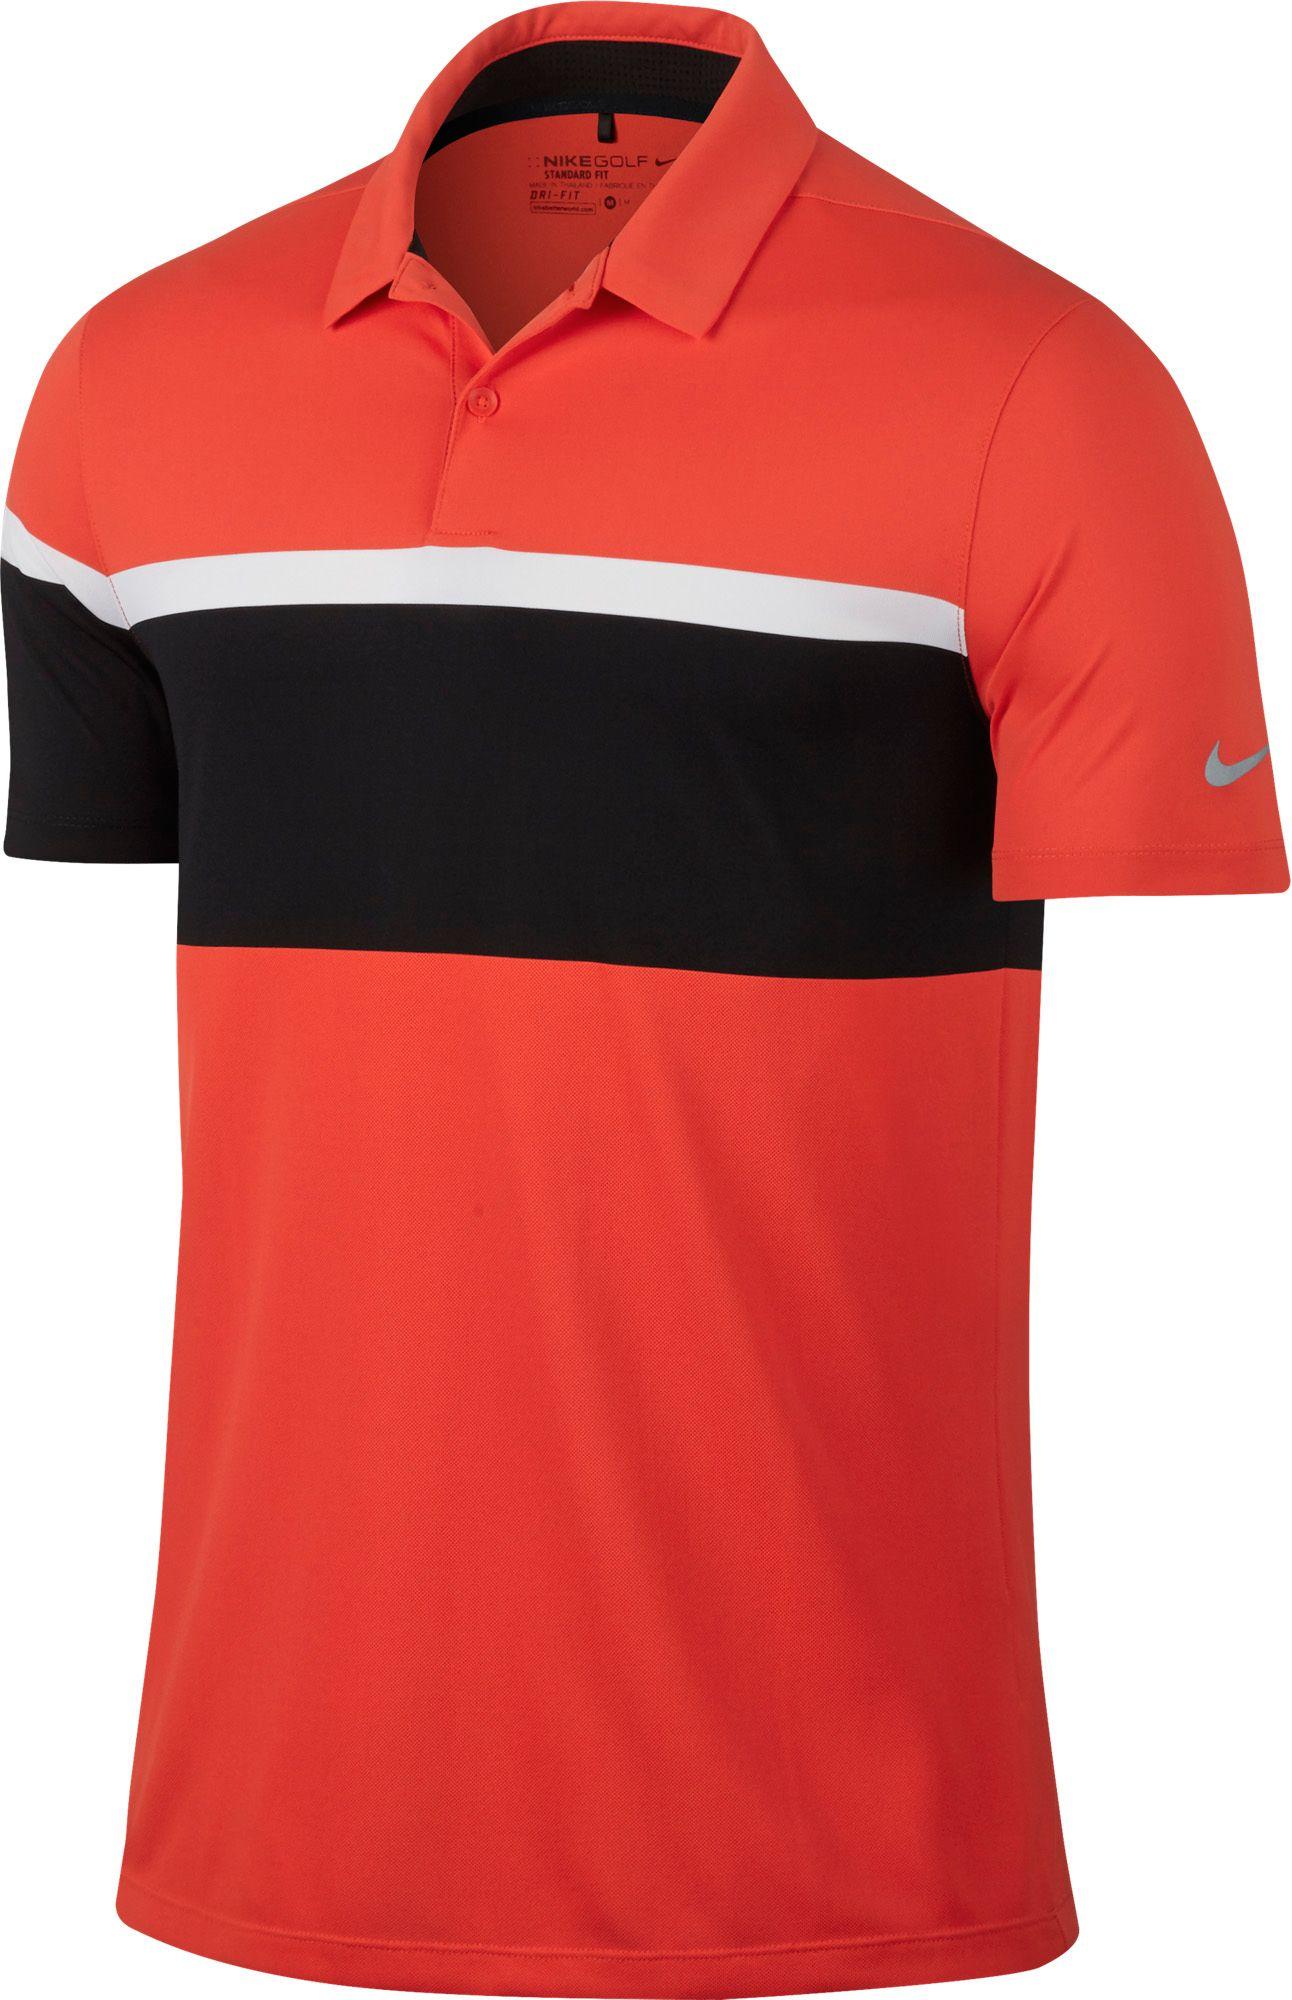 1c06cd10edfba Callaway Golf Performance Colorblock Polo Shirt – Rockwall Auction